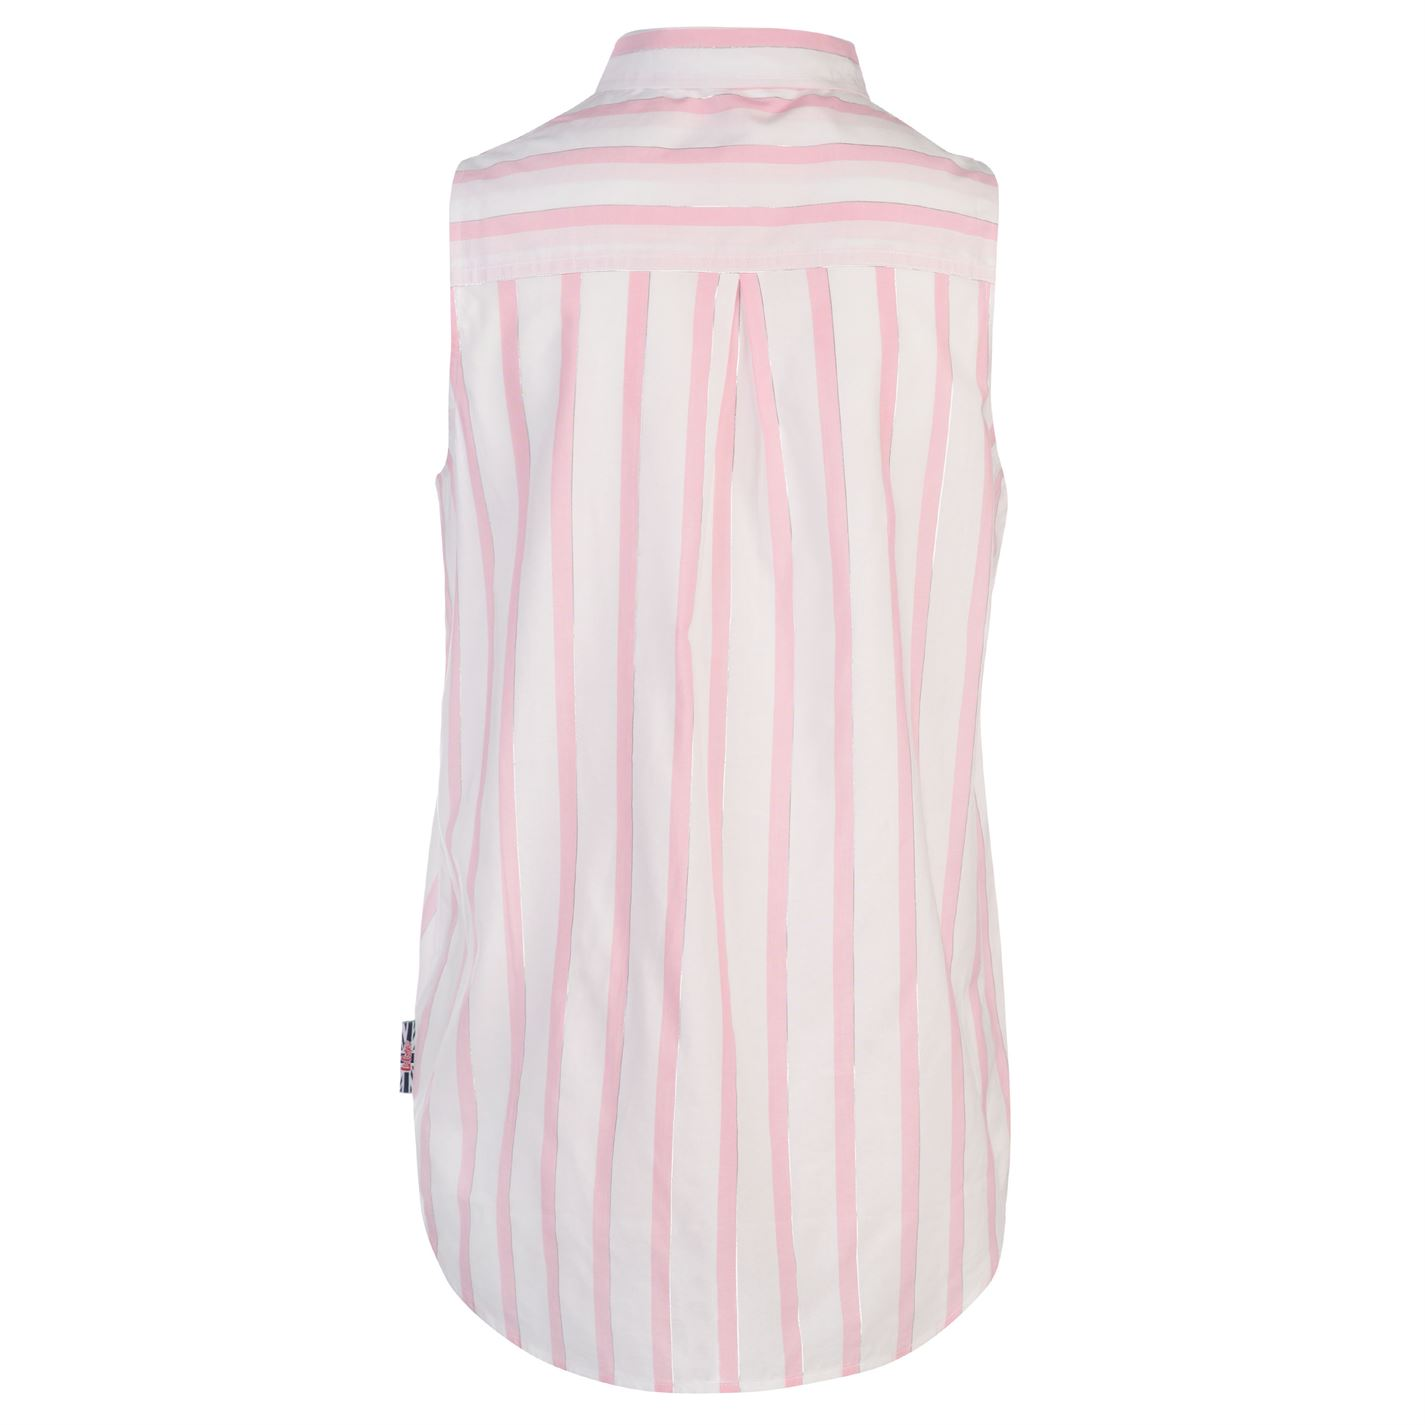 Lee Cooper Sleeveless Shirt Ladies Everyday Lightweight Button